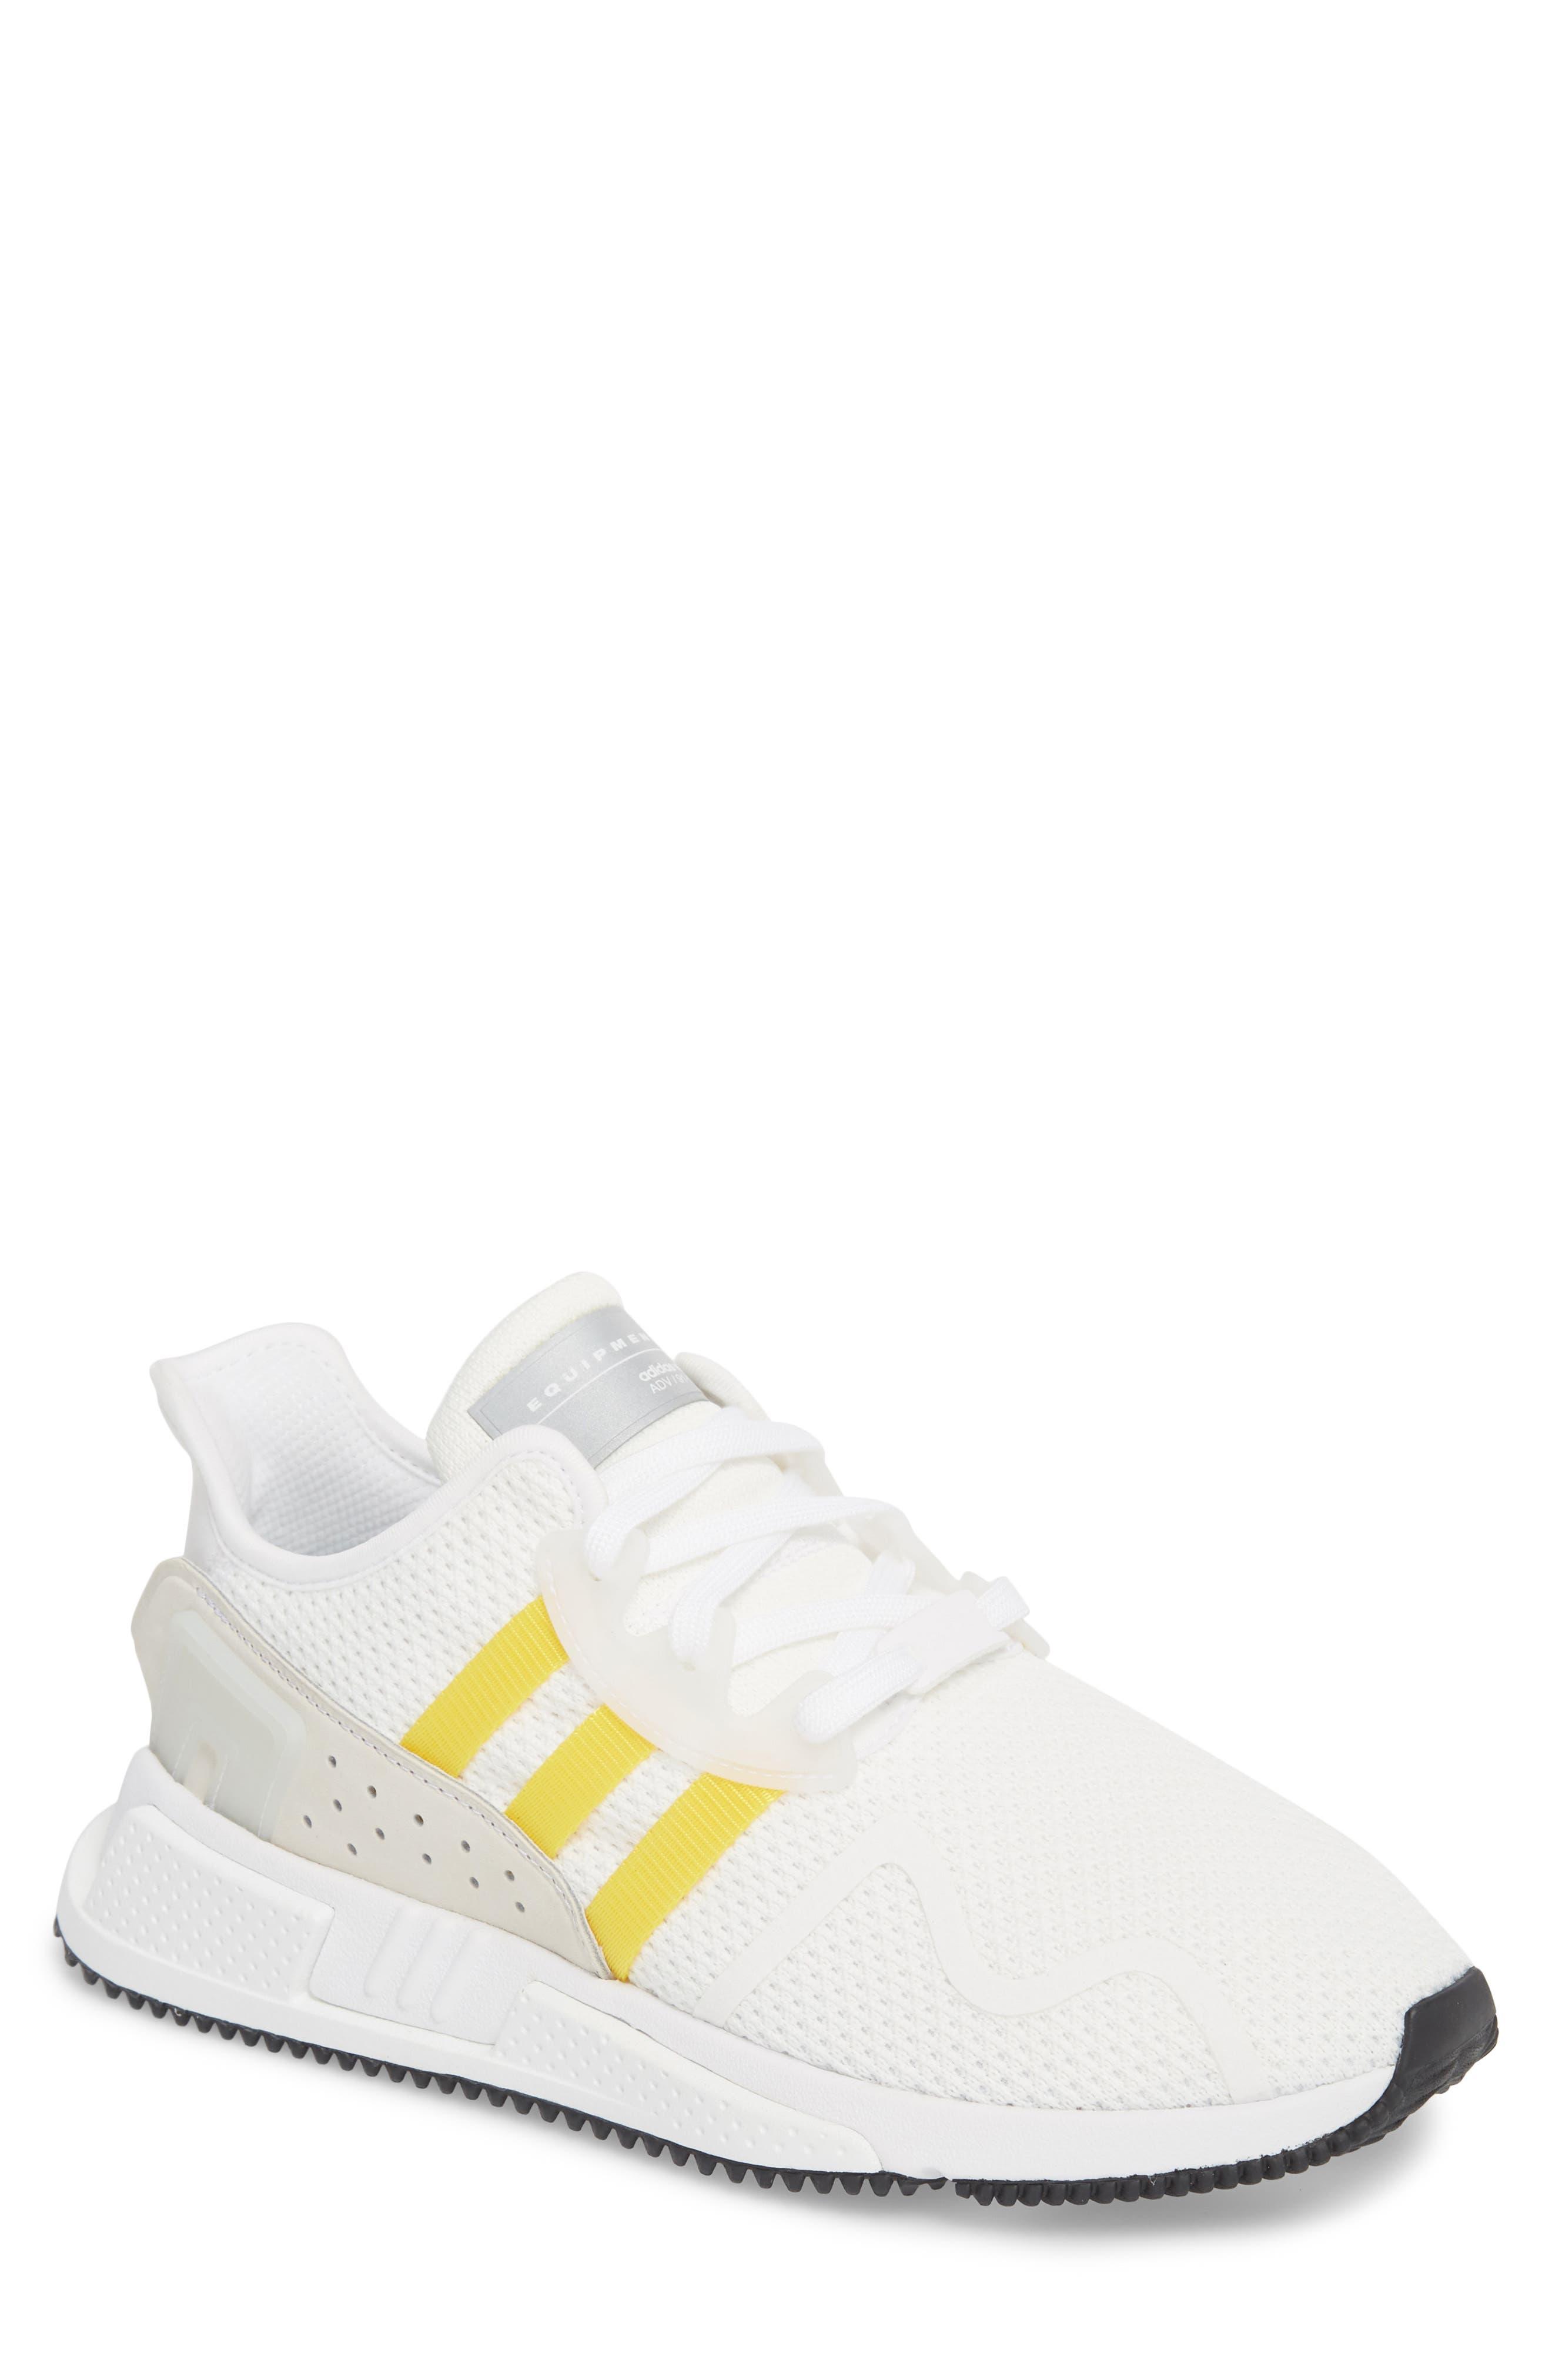 EQT Cushion ADV Sneaker,                             Main thumbnail 1, color,                             100